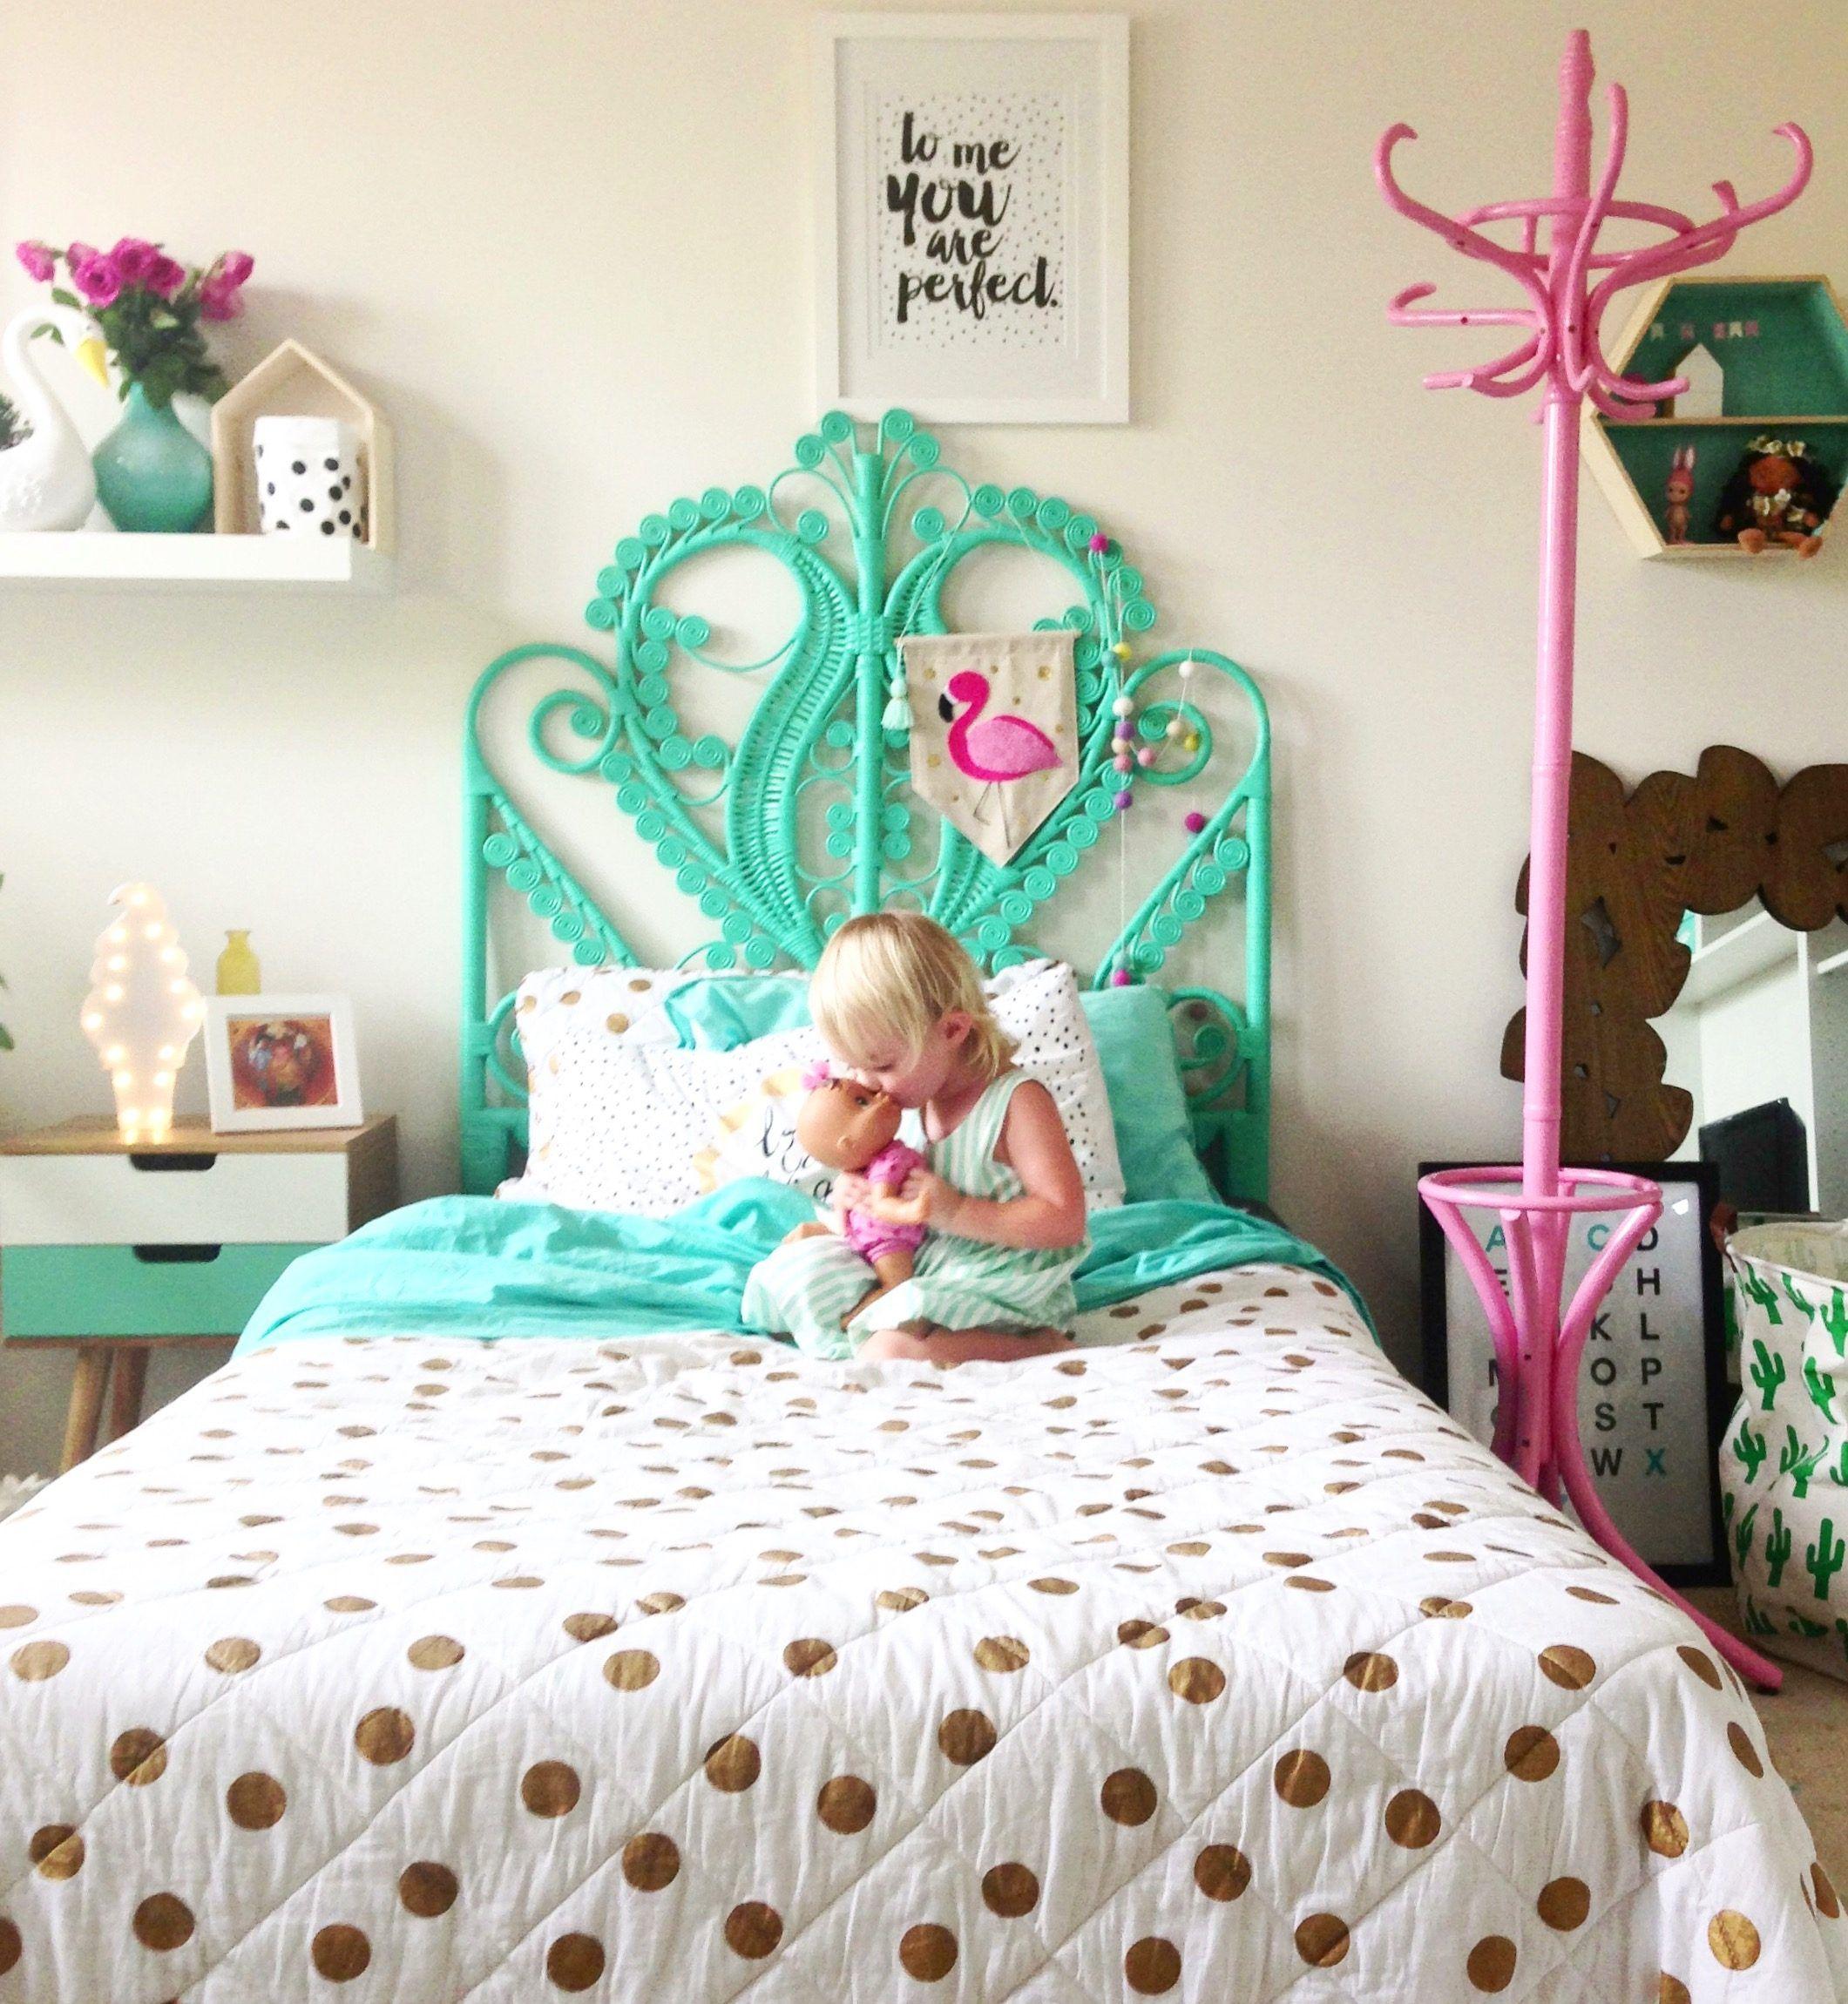 Way Back Wednesday - Kids Room Ideas | Bedroom decor, Girl ...